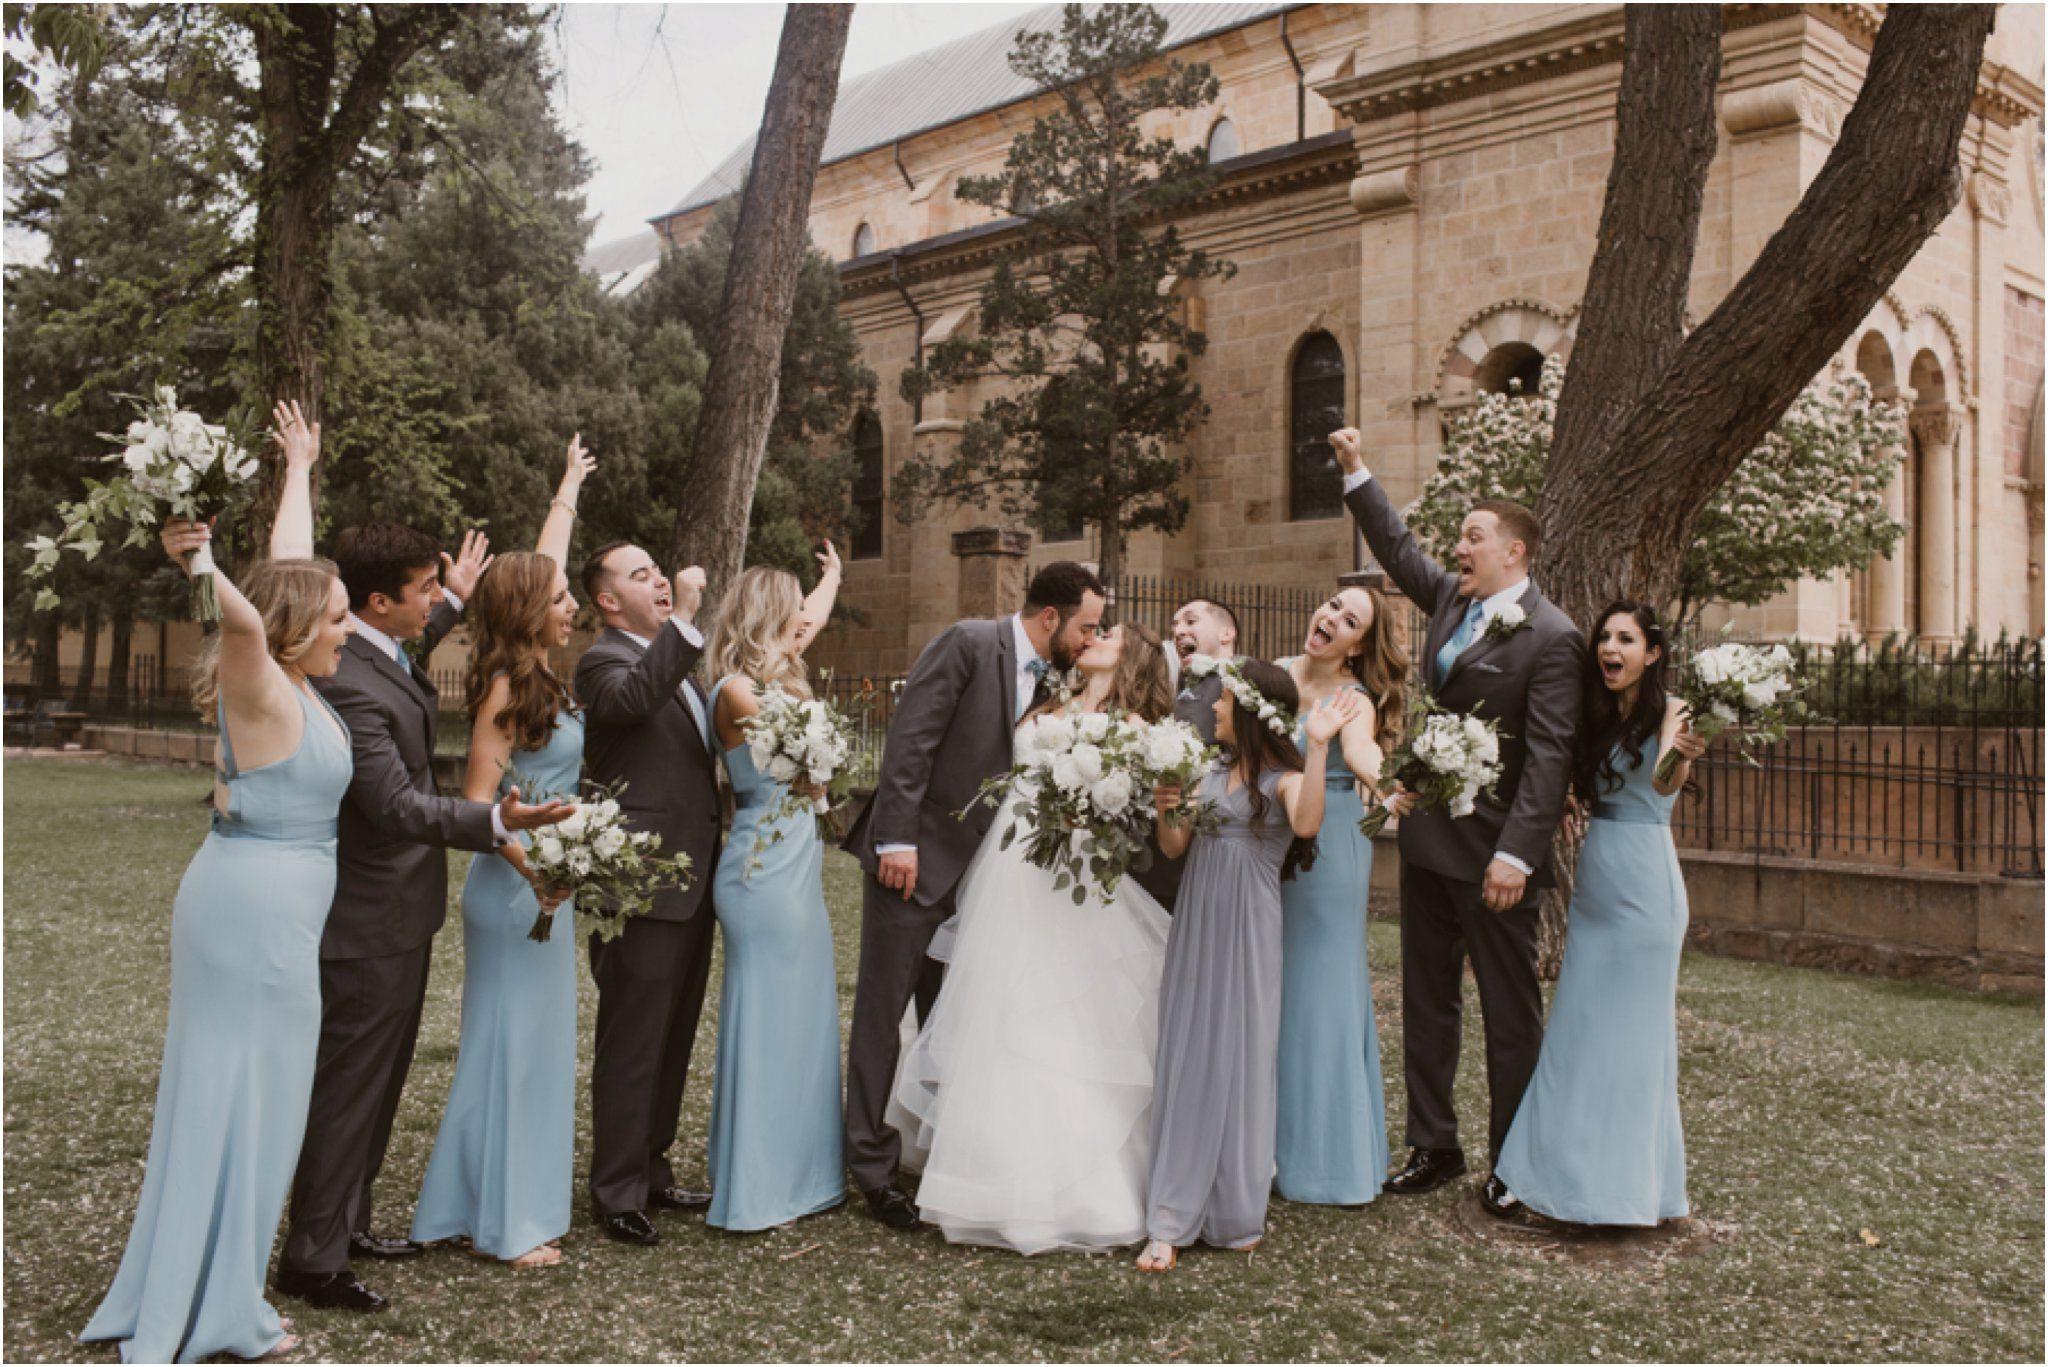 23Blue Rose Photography_ Albuquerque_ Santa Fe_ New Mexico wedding photographers